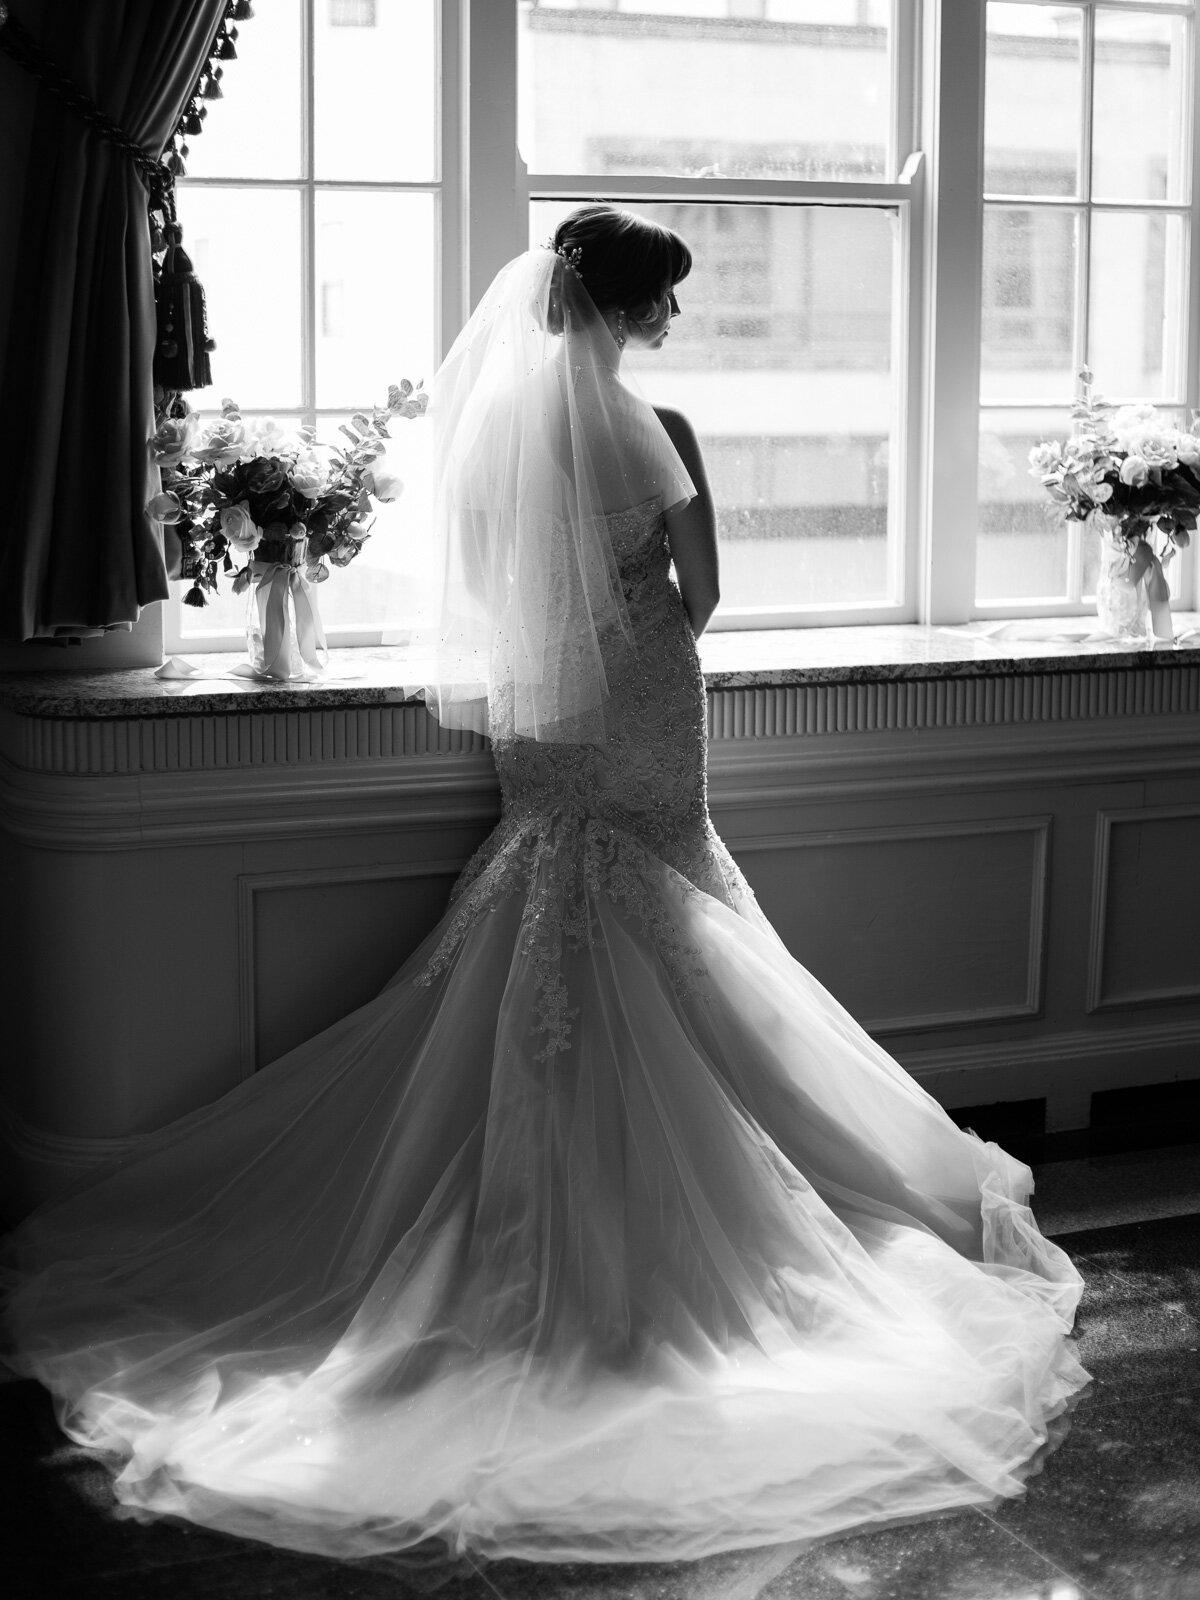 Intimate+Onesto+Wedding+by+Cleveland+Wedding+Photographer+Matt+Erickson+Photography.jpg